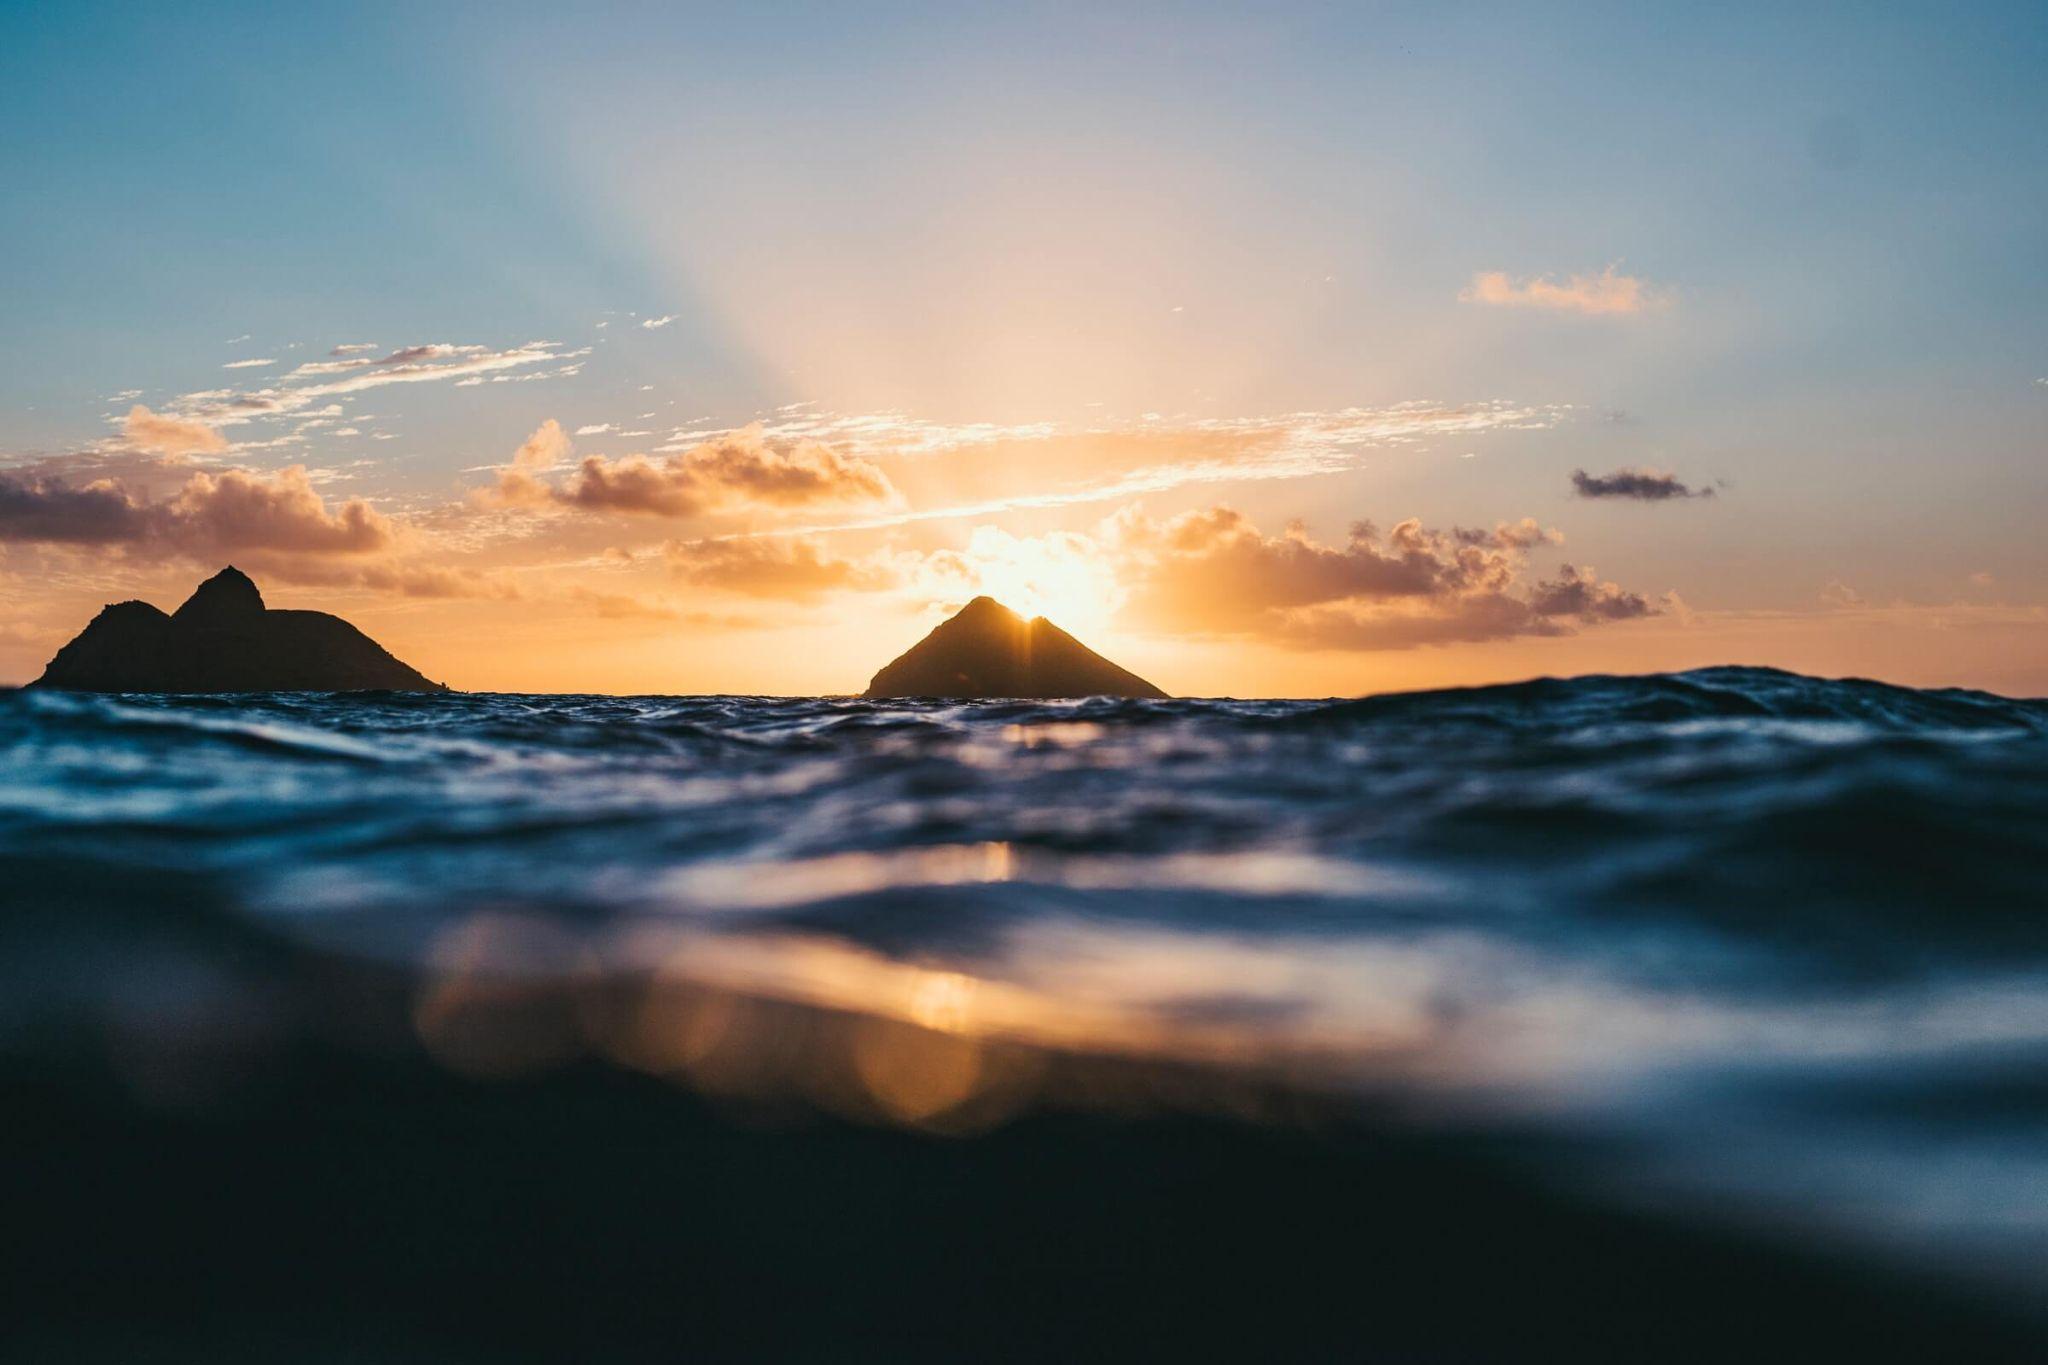 sunrise at Lanikai Beach, most stunning sunrise in Oahu